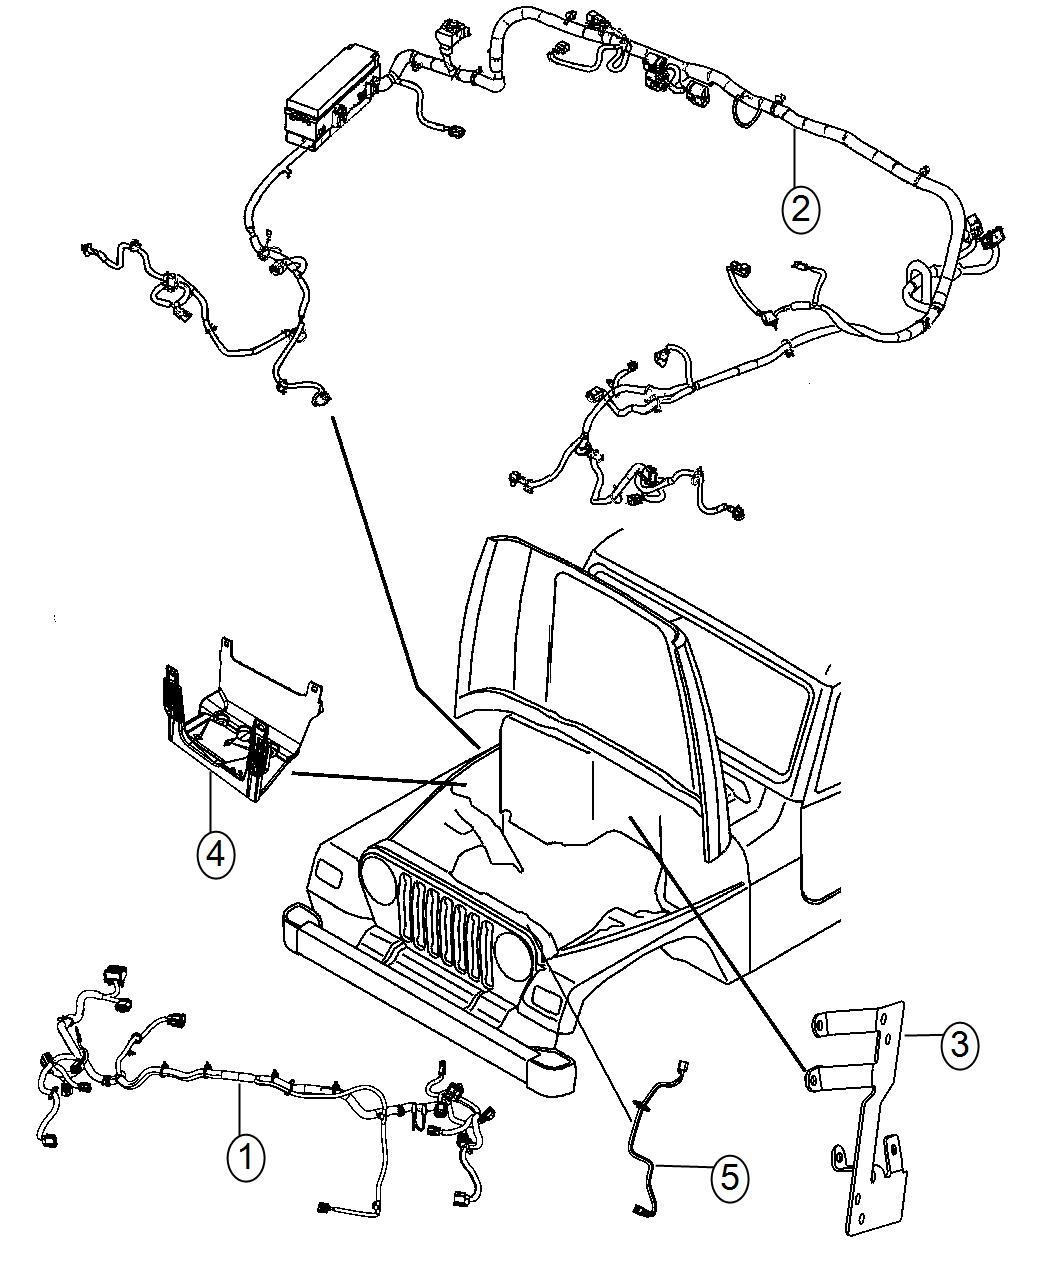 tags: #golf cart battery wiring diagram#club car battery wiring diagram#kenworth  battery wiring diagram#gem car battery placement#club car wiring